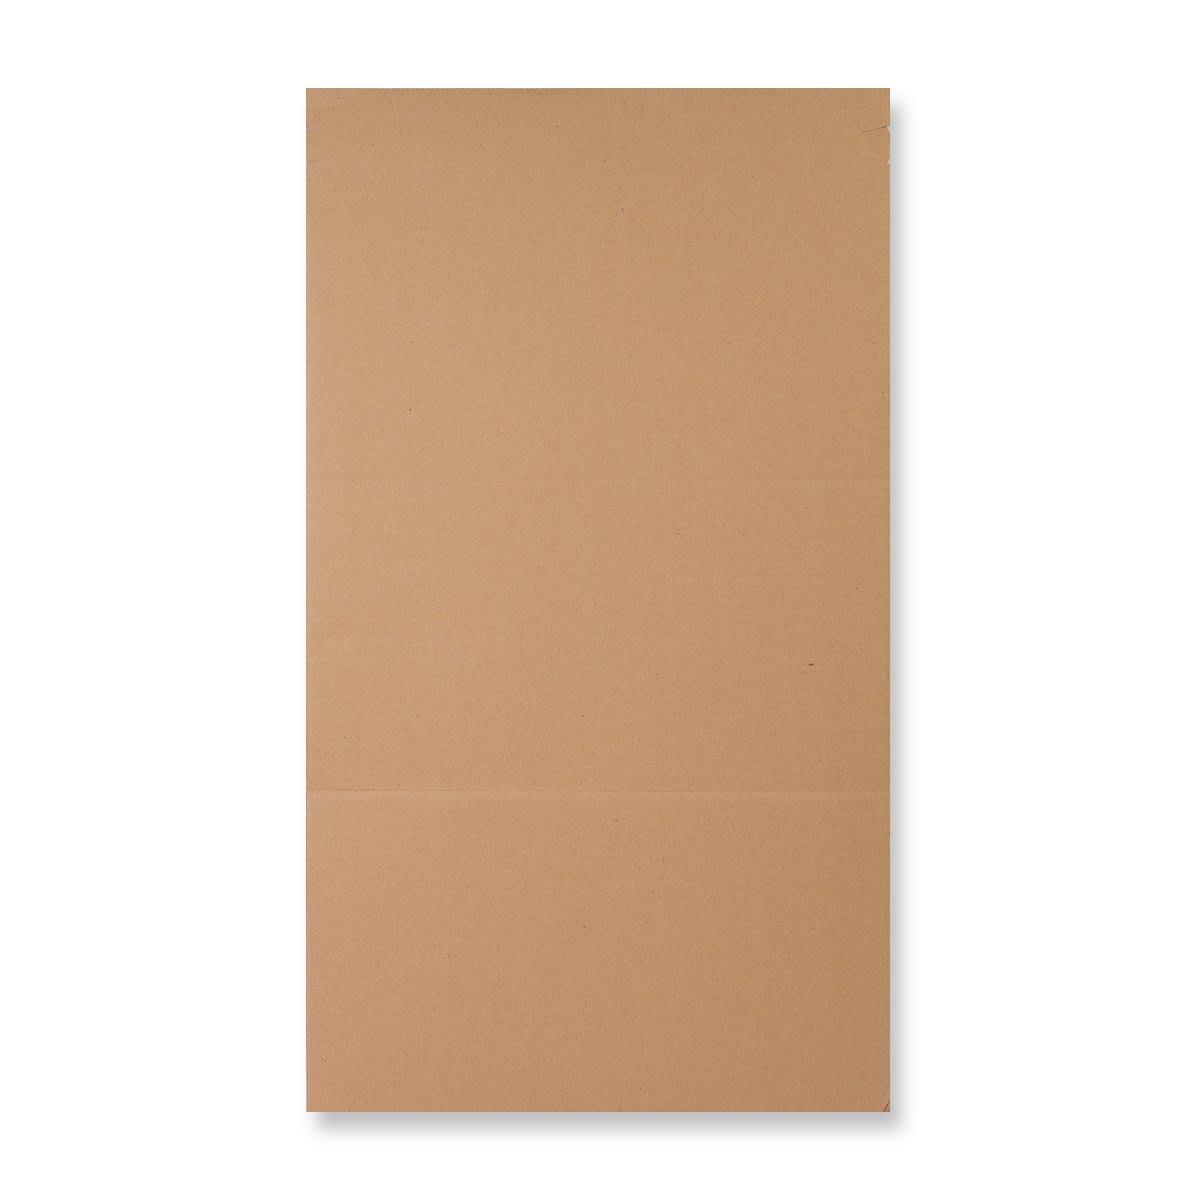 C2 Book Wrap Mailer (251 mm x 165 mm)